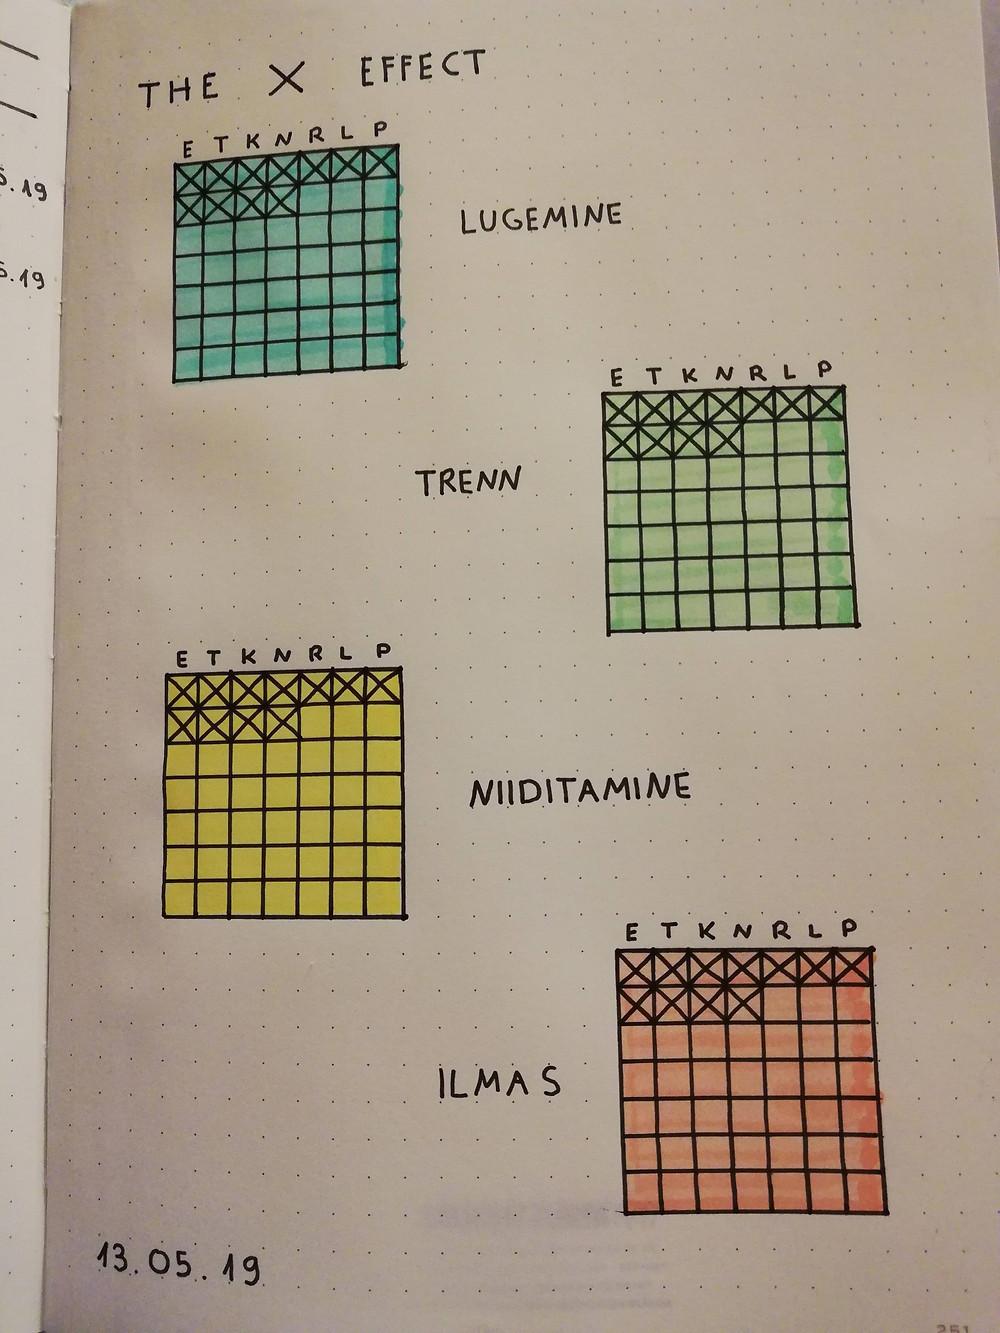 four x effect grids